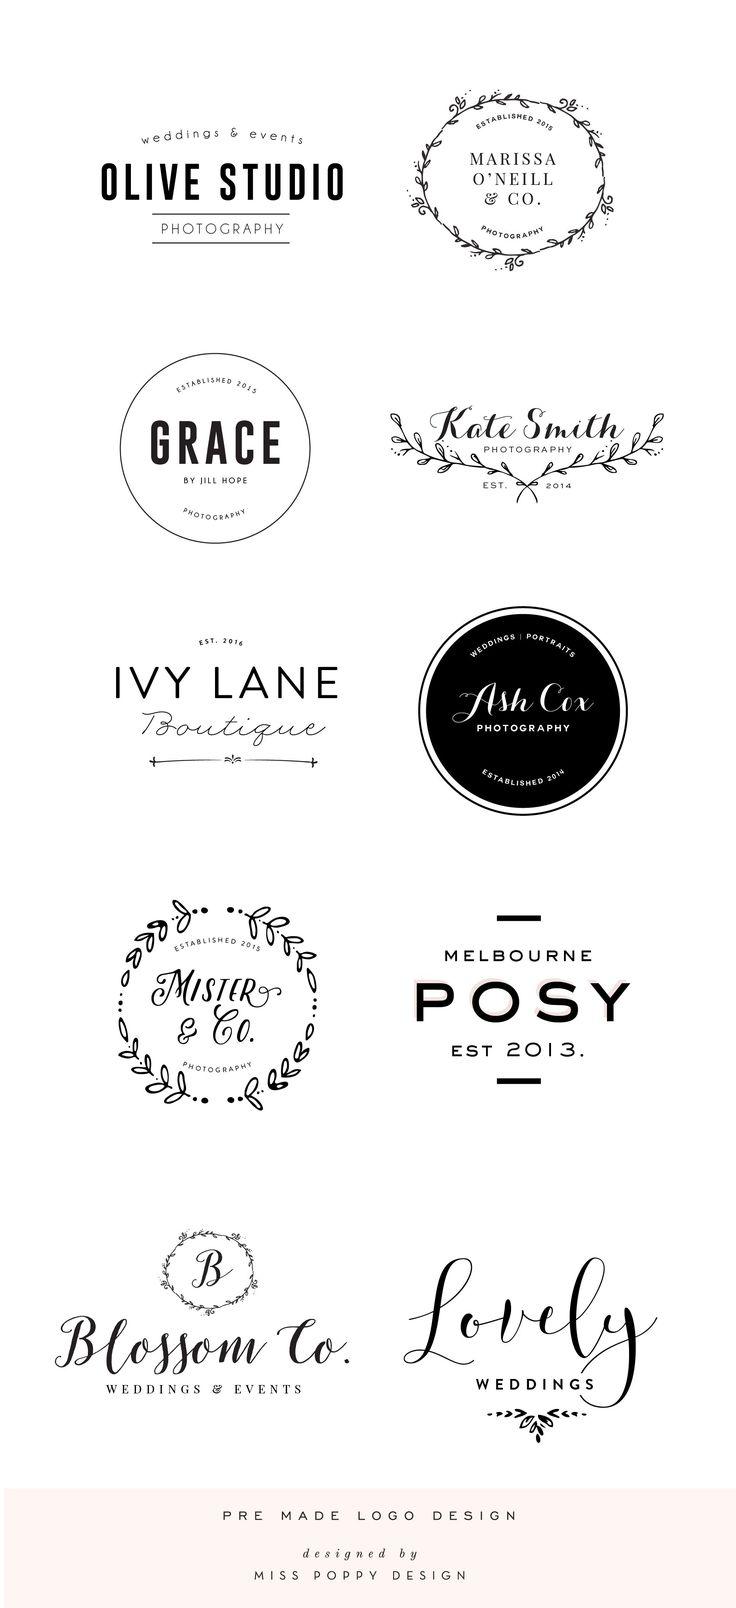 Pre Made Logo Design: Boutique: Phtographer: Small Business: Florist: Wedding: Laurel: Calligraphy // by Miss Poppy Design www.misspoppydesignshop.com                                                                                                                                                                                 Más